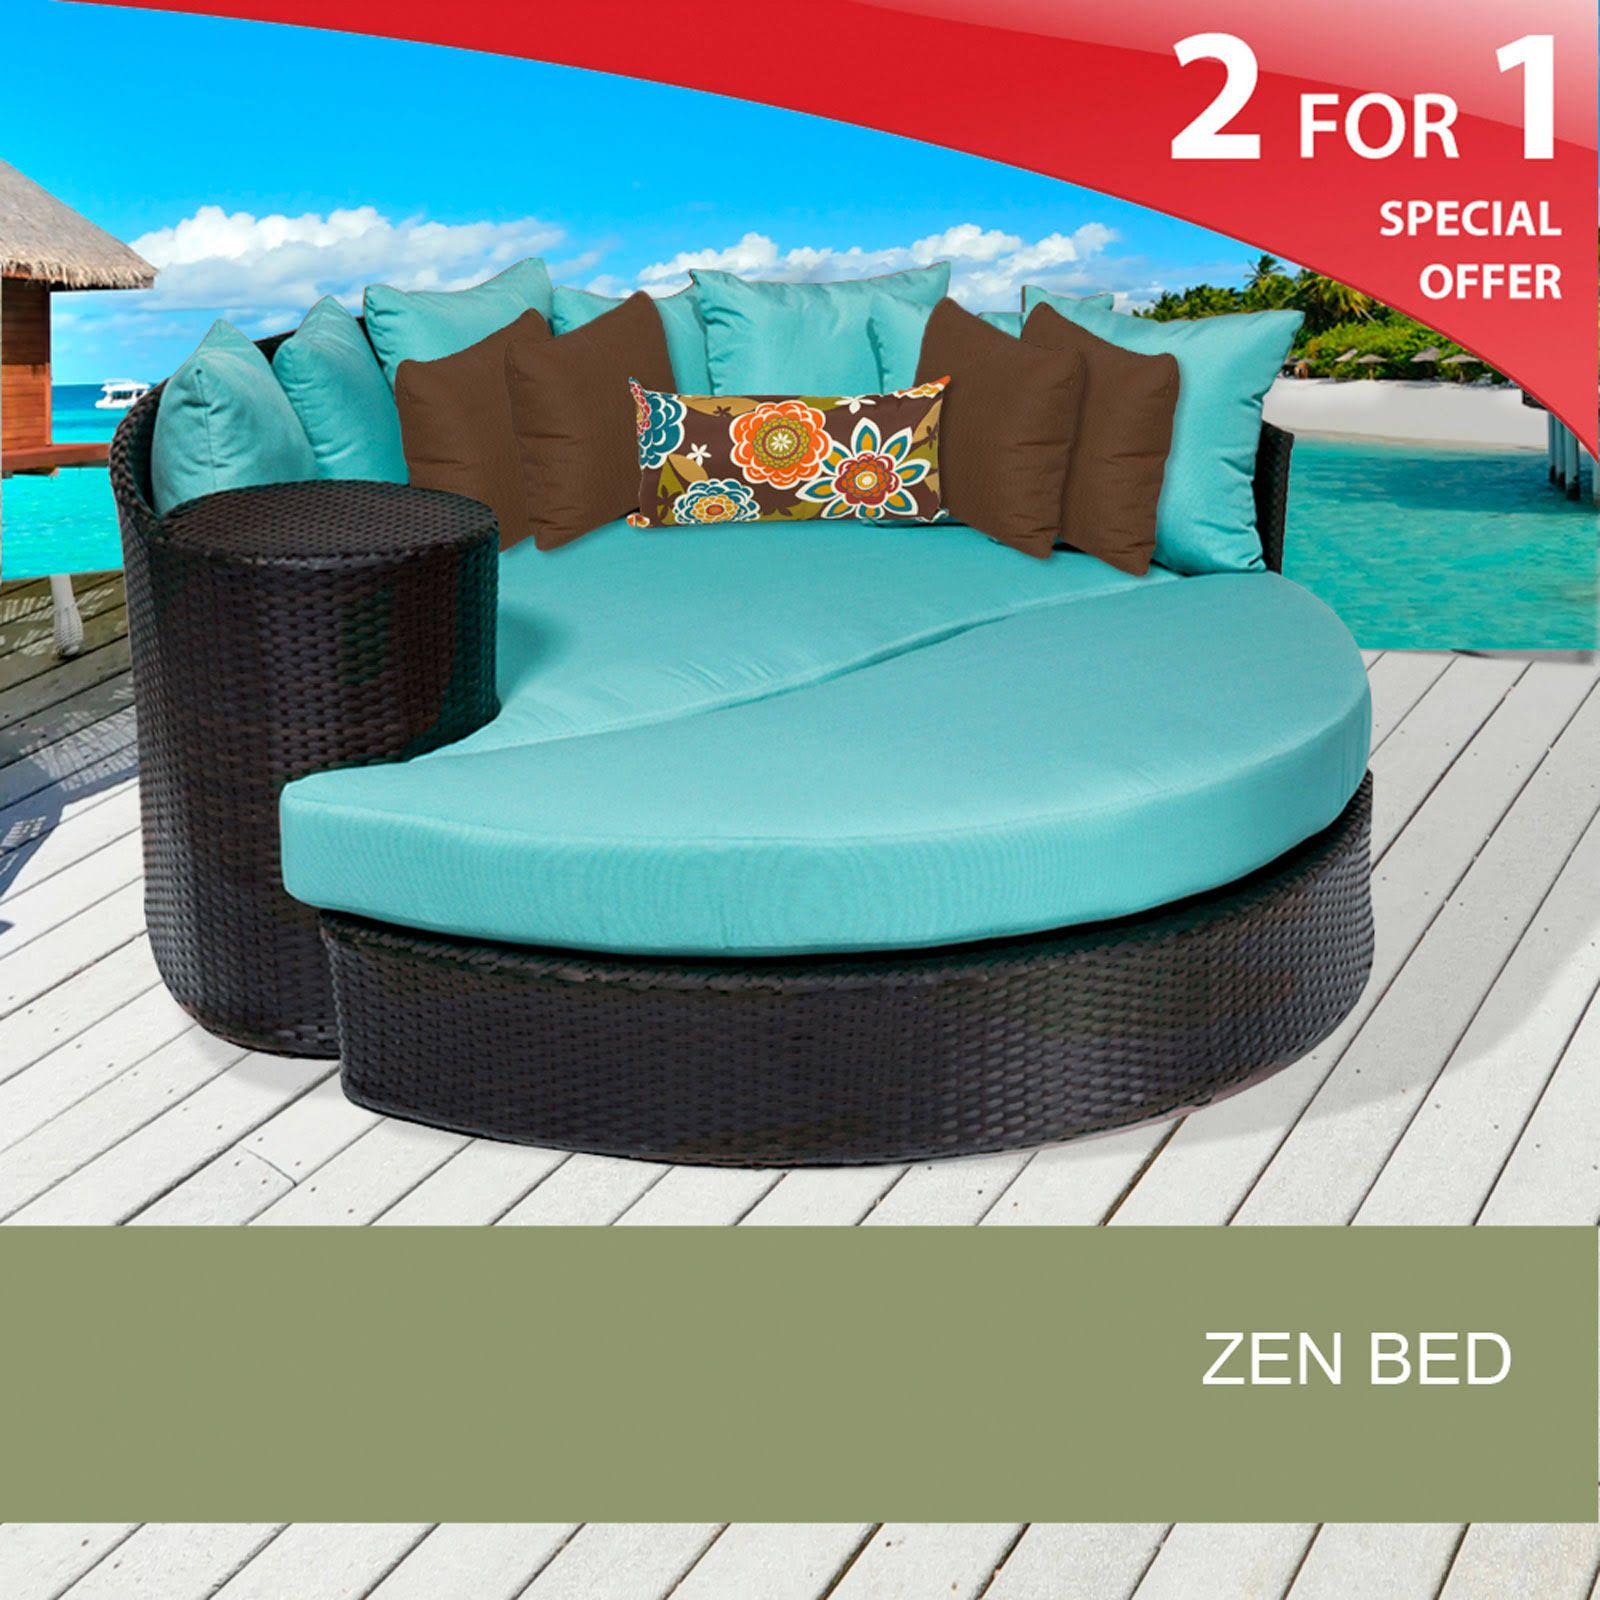 TKC Zen Circular Sun Bed Outdoor Wicker Patio Furniture Wheat